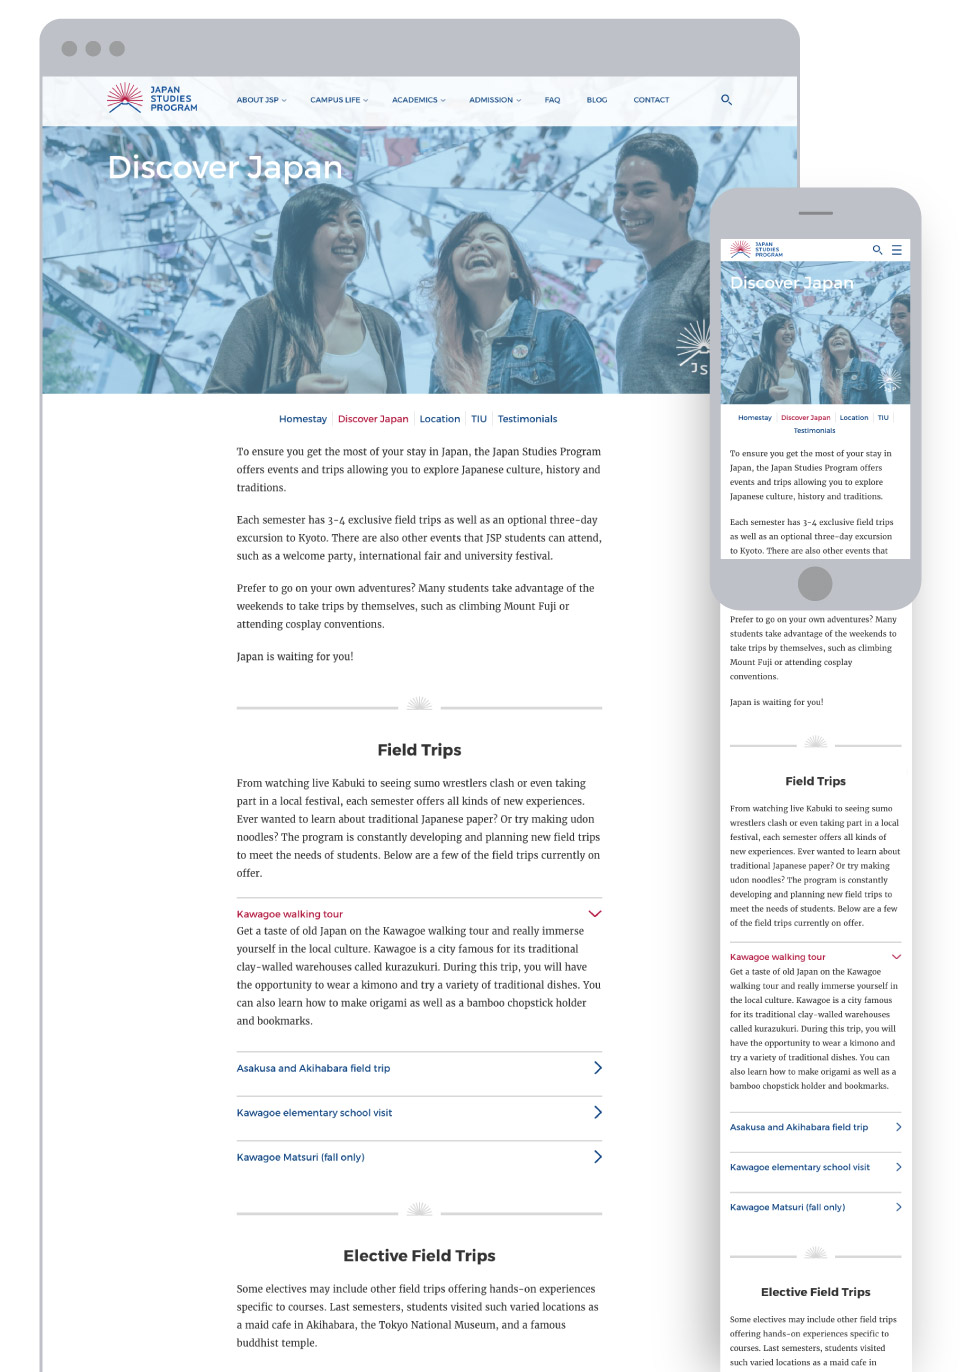 Japan Studies Program for Tokyo International University - Field Trips Page